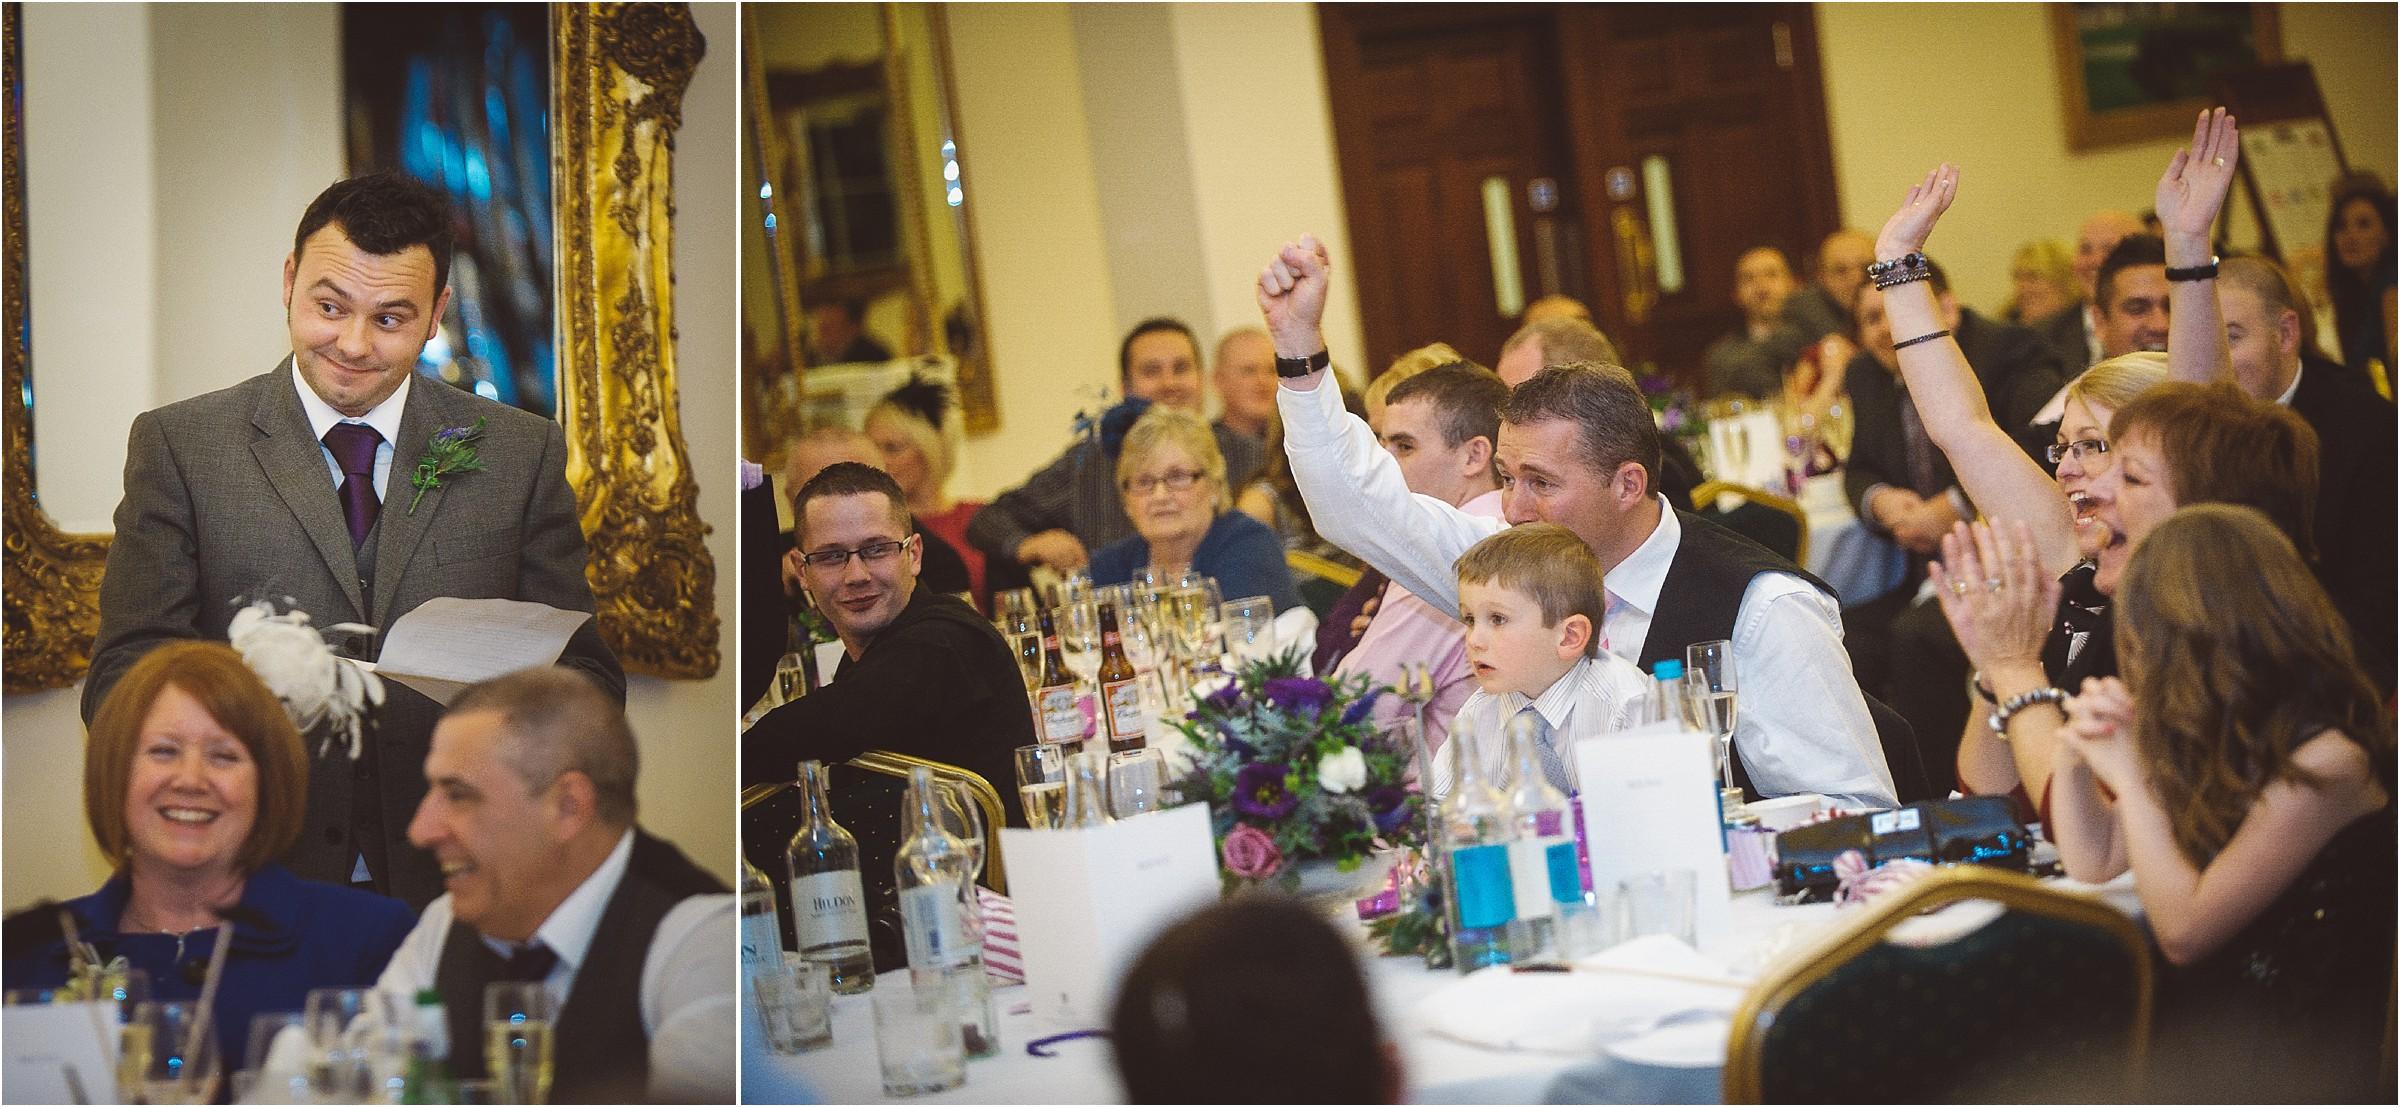 048 wedding photography doxford hall northumberlandDSC_1150e